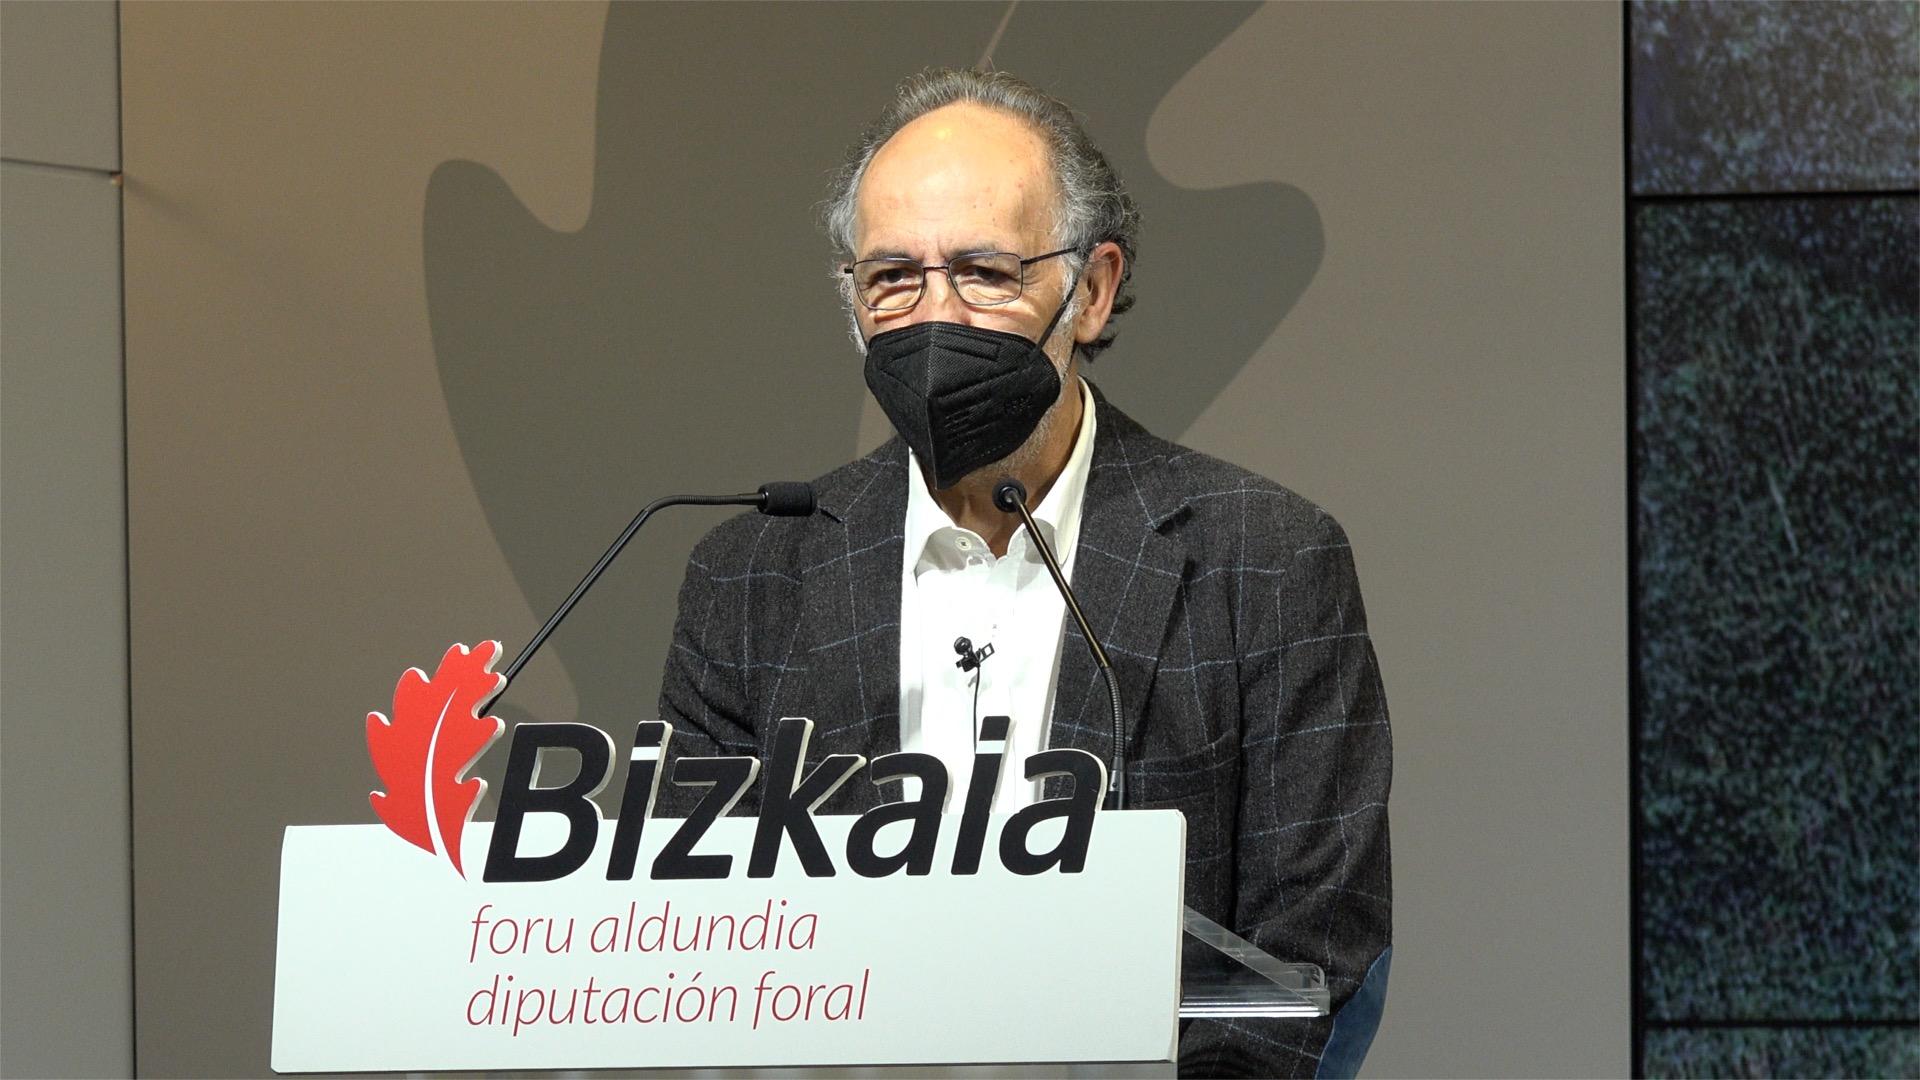 Jose Ibarrola